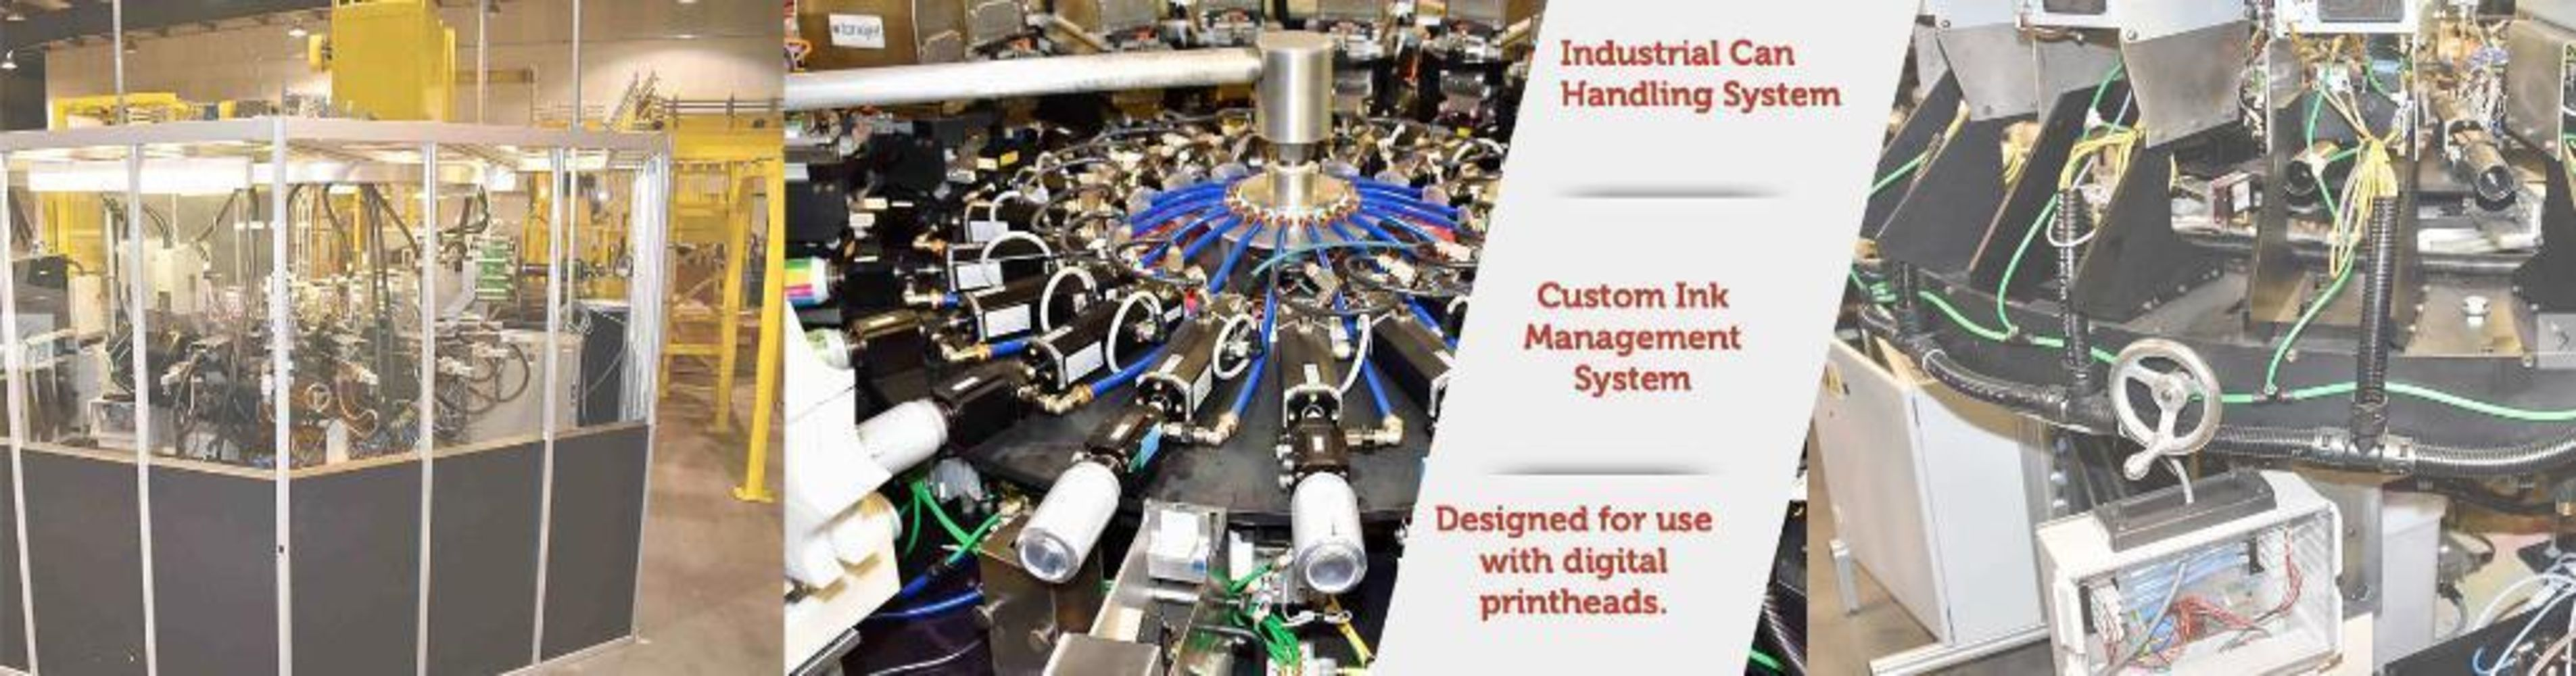 Beverage Can Printing & Handling System